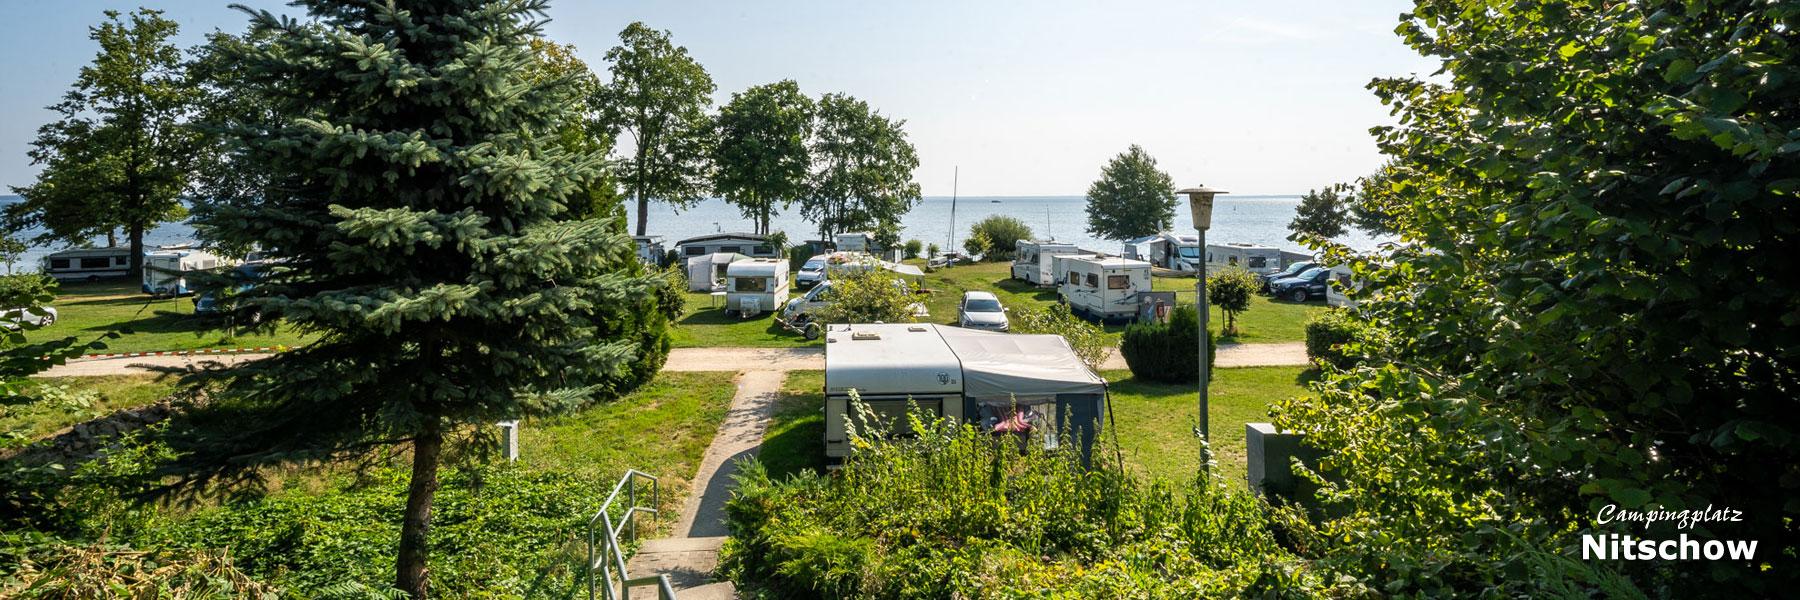 Nitschow-Camping - Müritz-Camp GmbH Gotthun